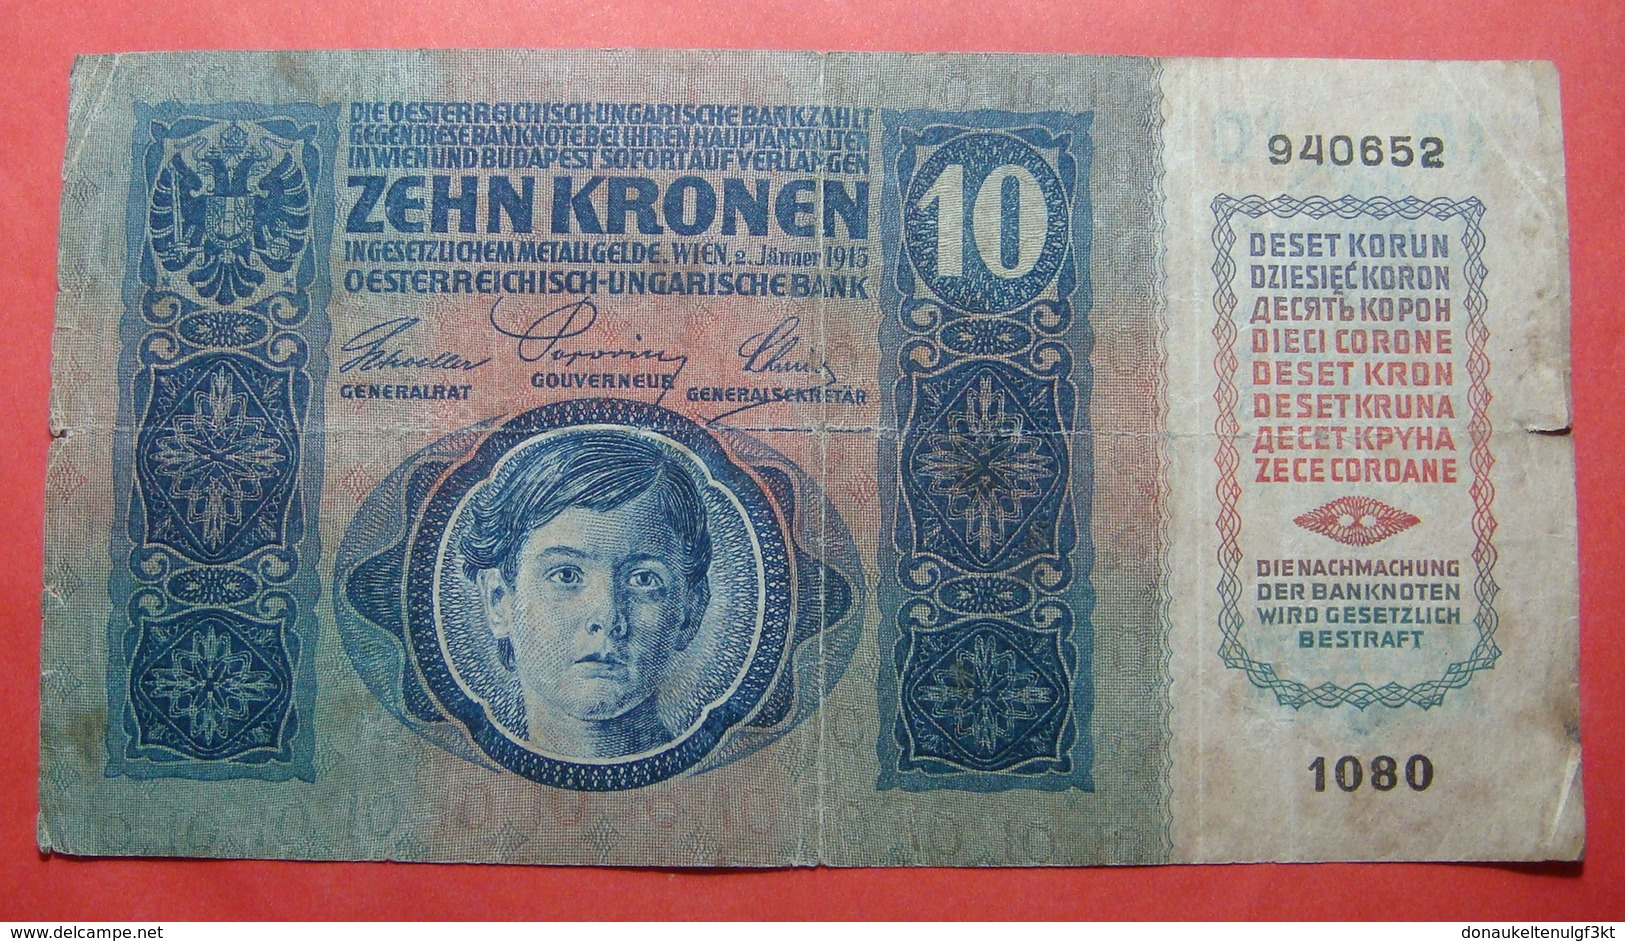 AUSTRIA 10 KRONEN 1915, Serial Number: 940652 - 1080 - Autriche